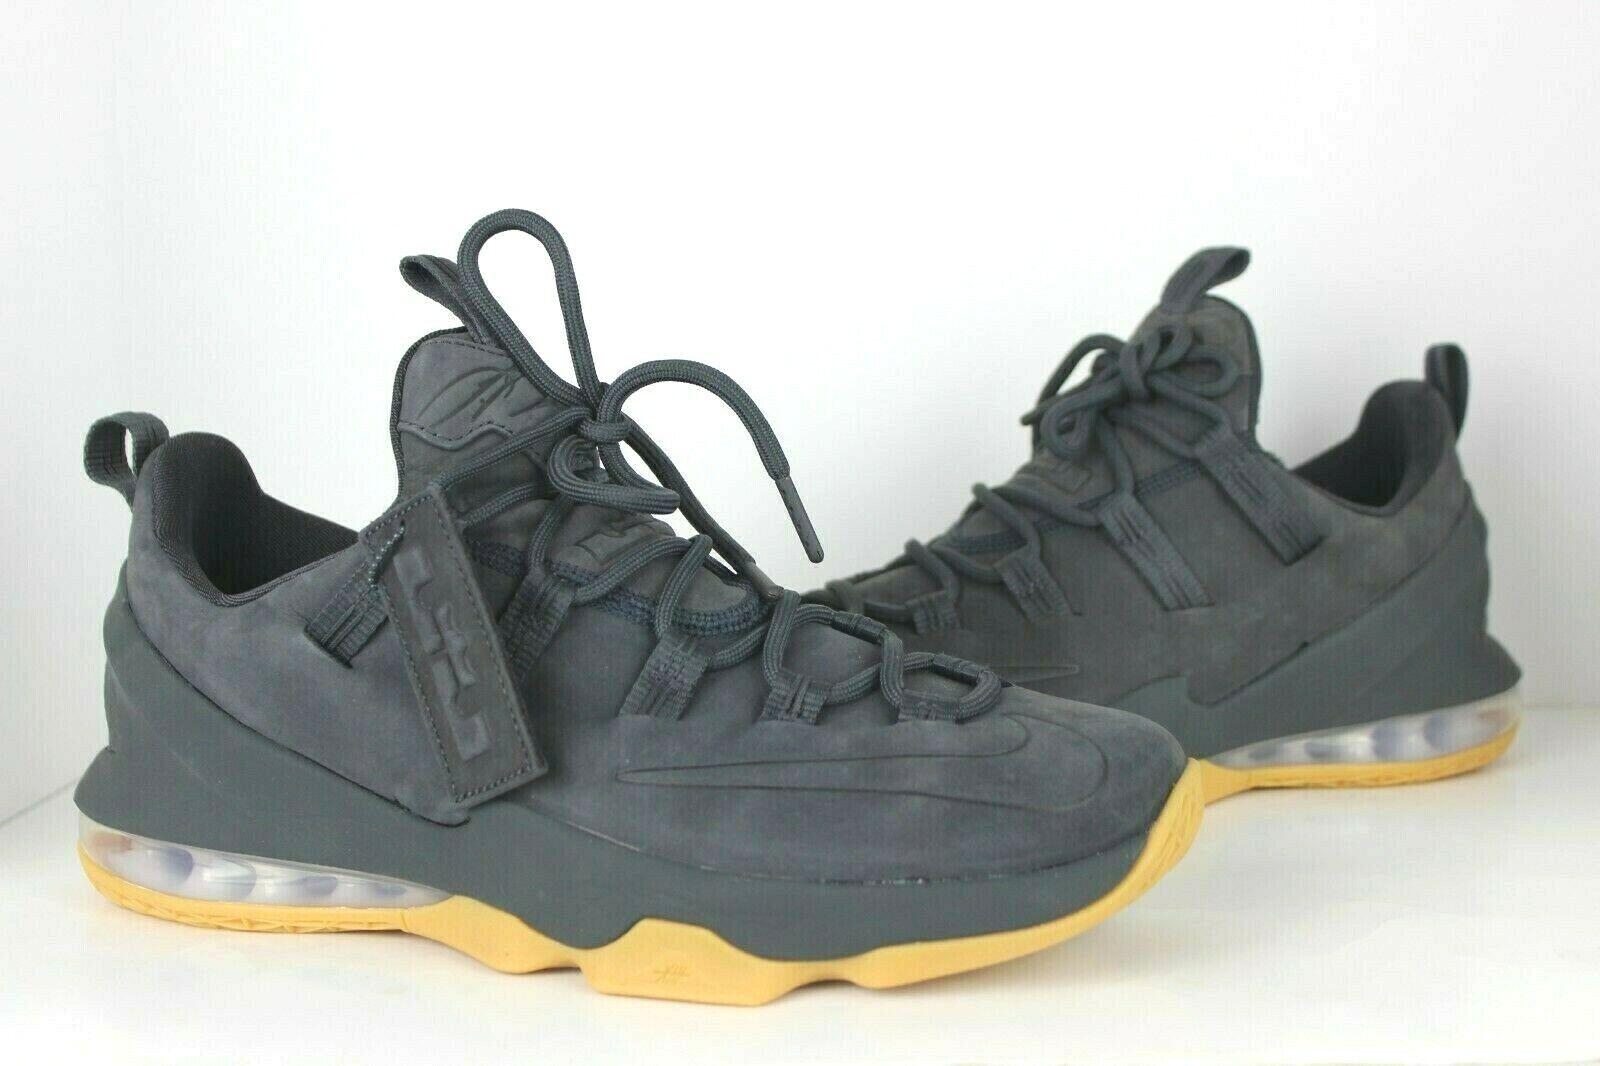 Nike Lebron XIII Low PRM Anthracite Dark Grey Suede Gum AH8289-001 Men's 8-9.5